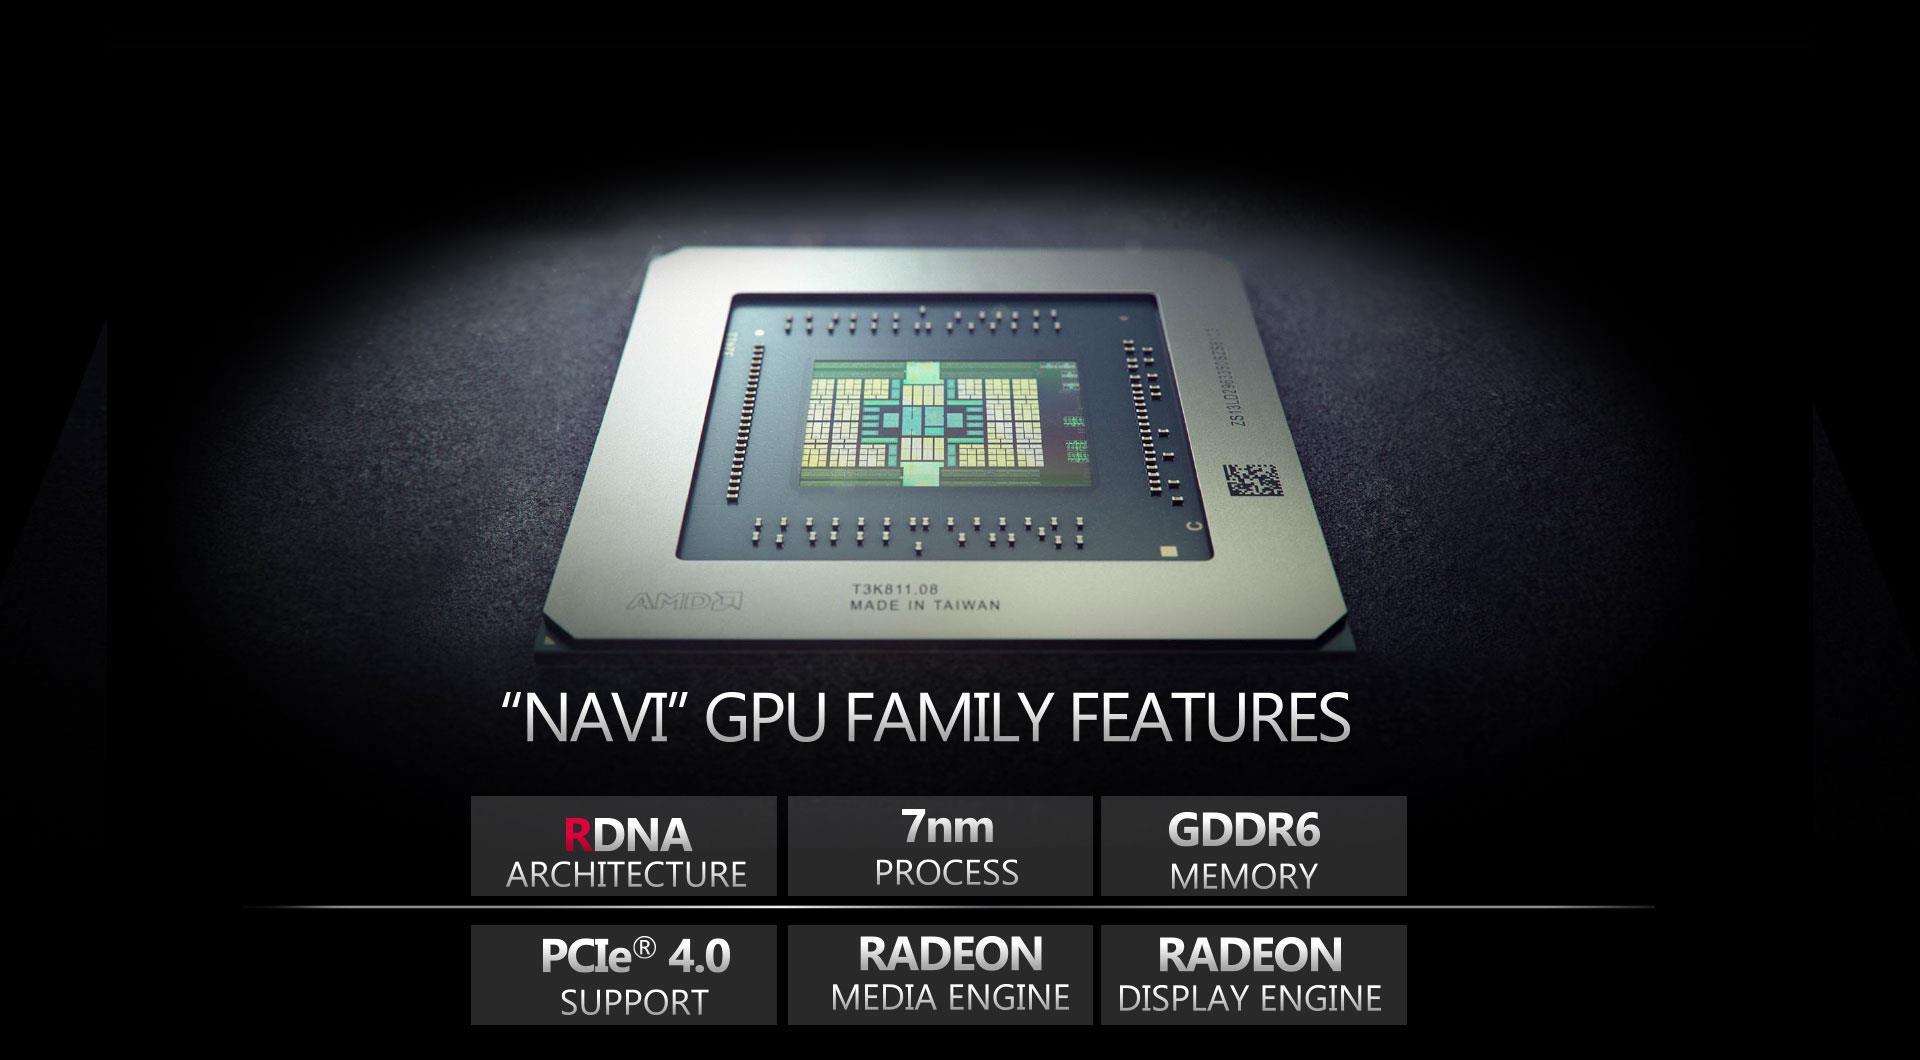 Sapphire Radeon RX 5700 8G Graphics Card